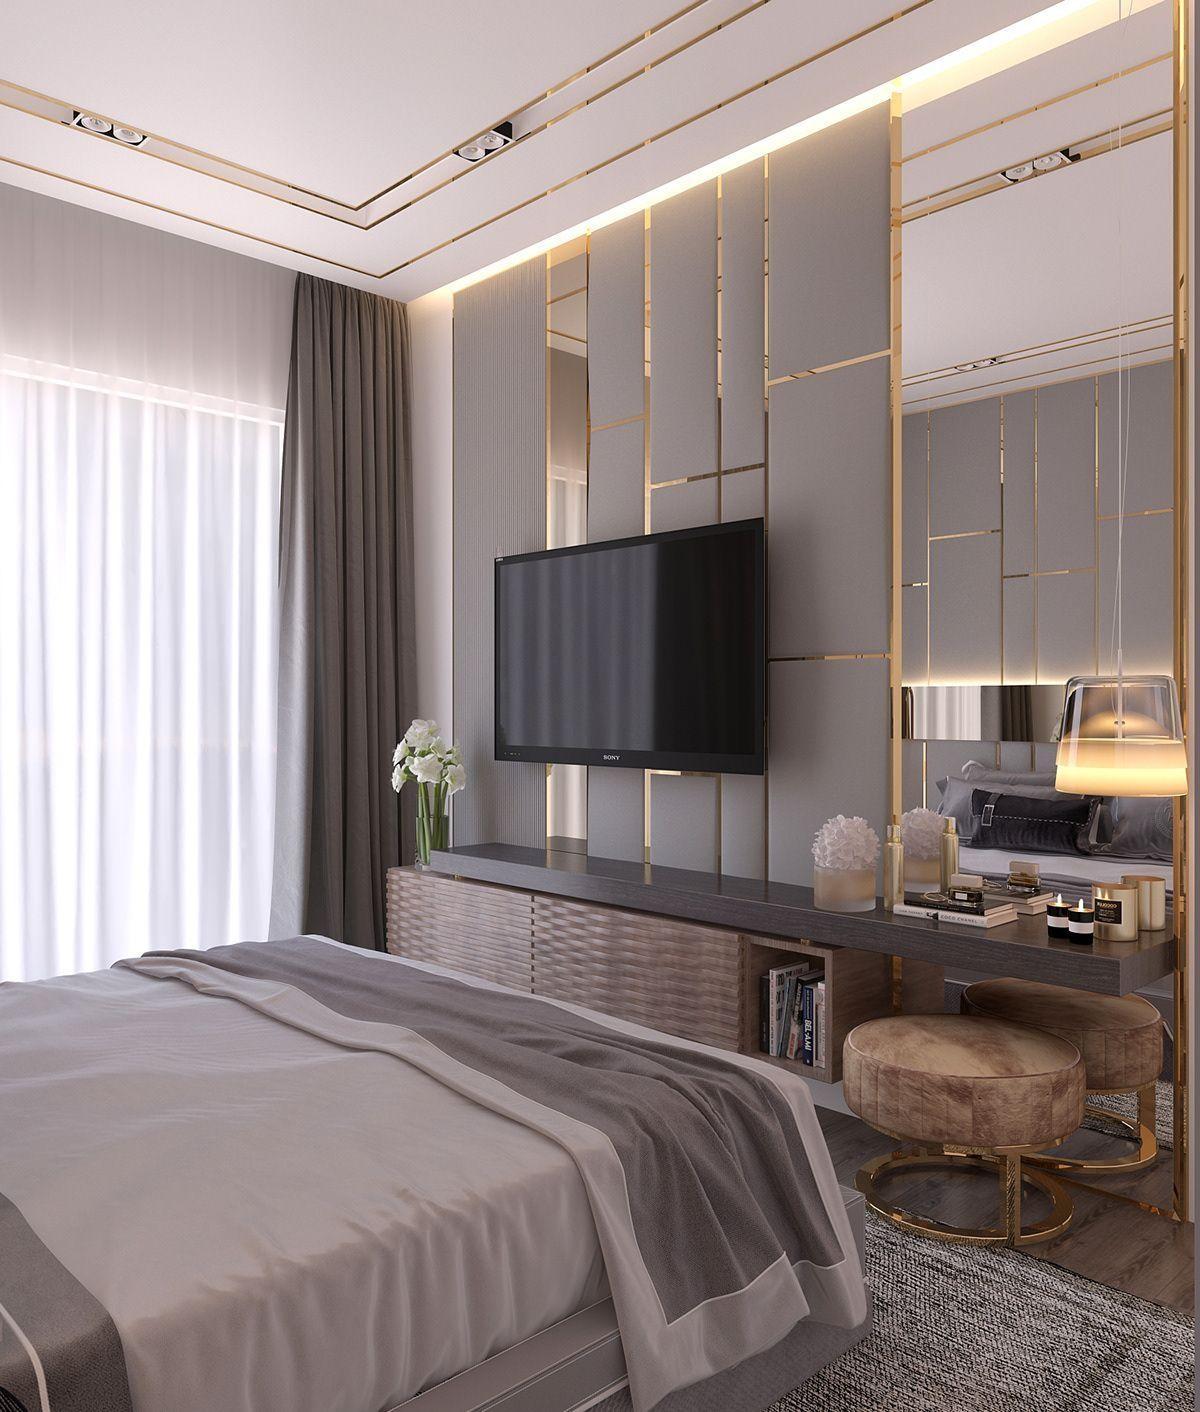 4.SIMPHOME.COM TV Backdrop in the Bedroom